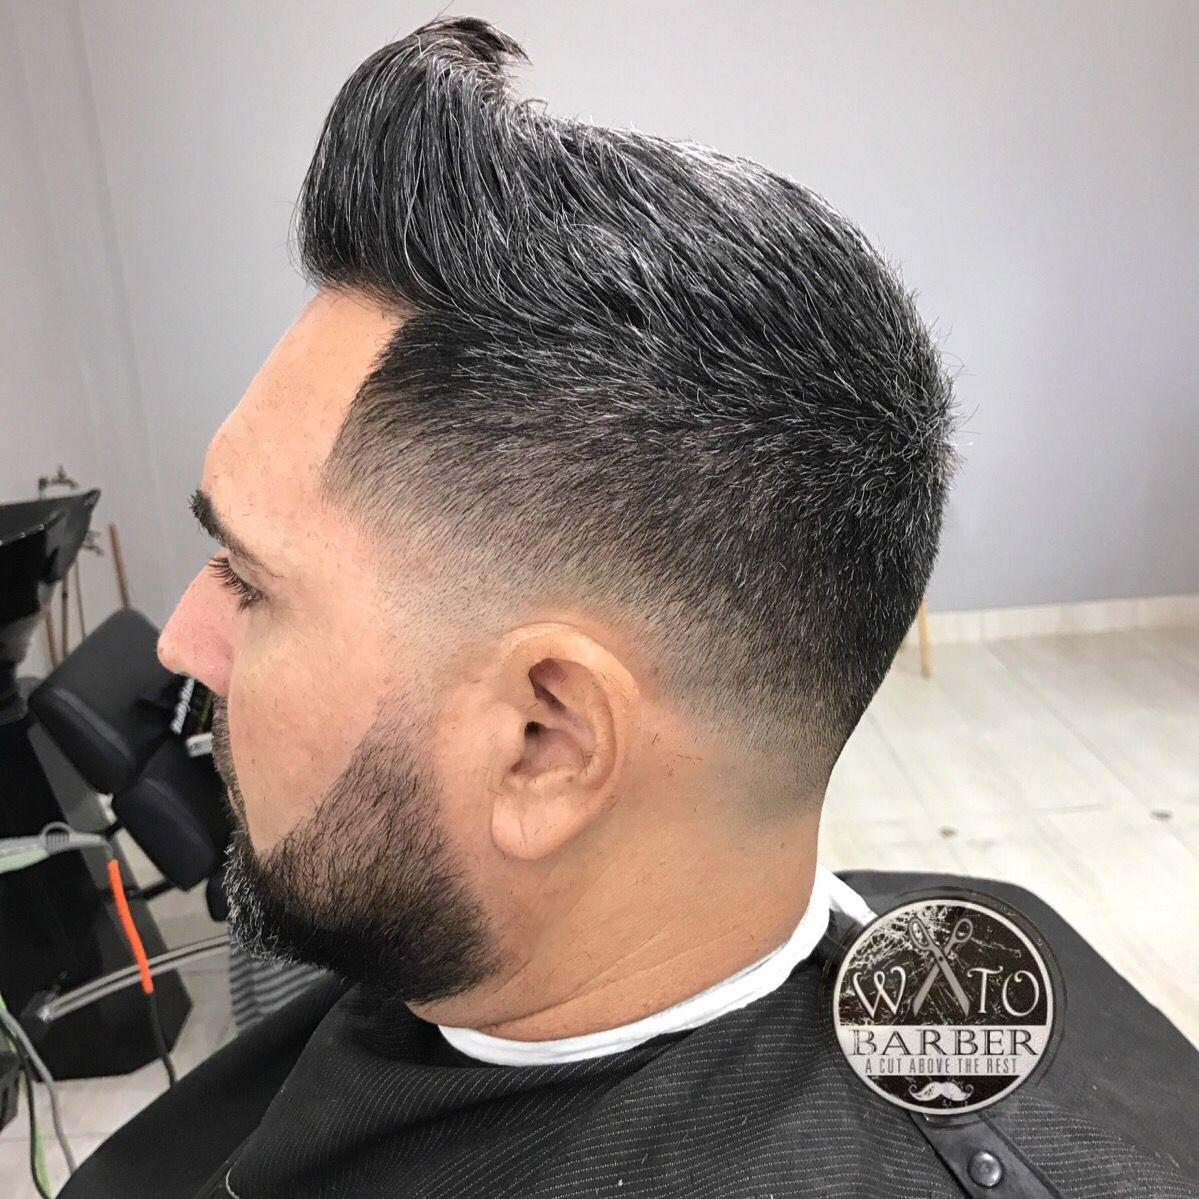 Wato barber watobarber on pinterest